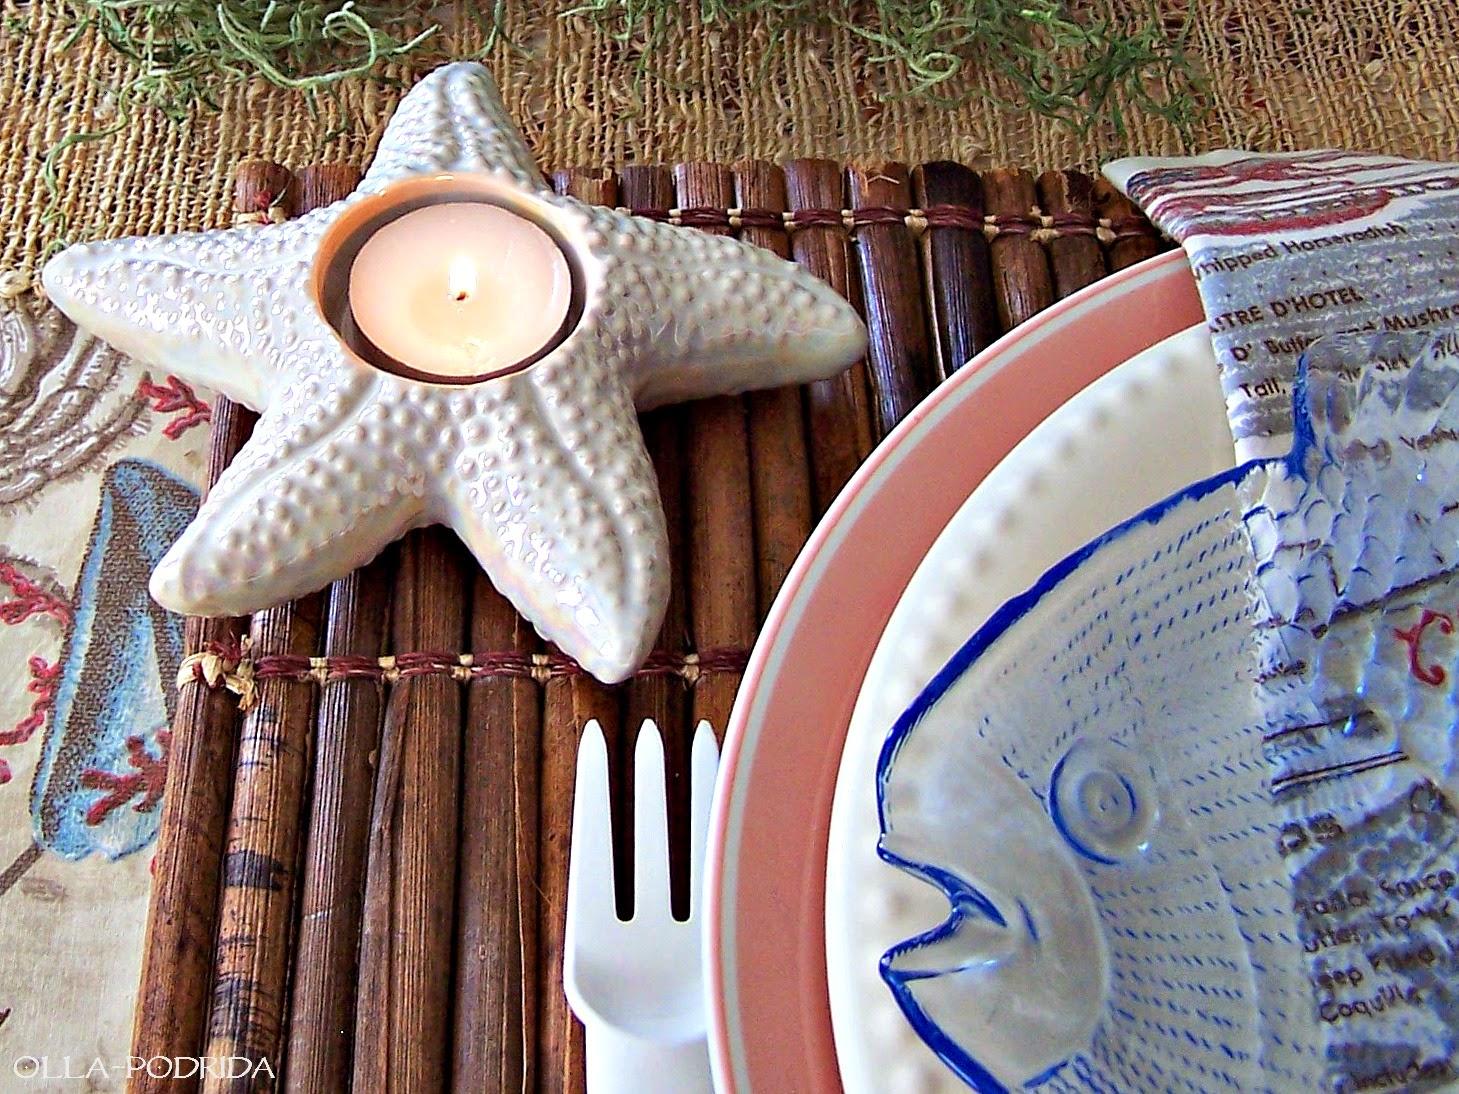 Olla Podrida Seaside Picnic Table Setting